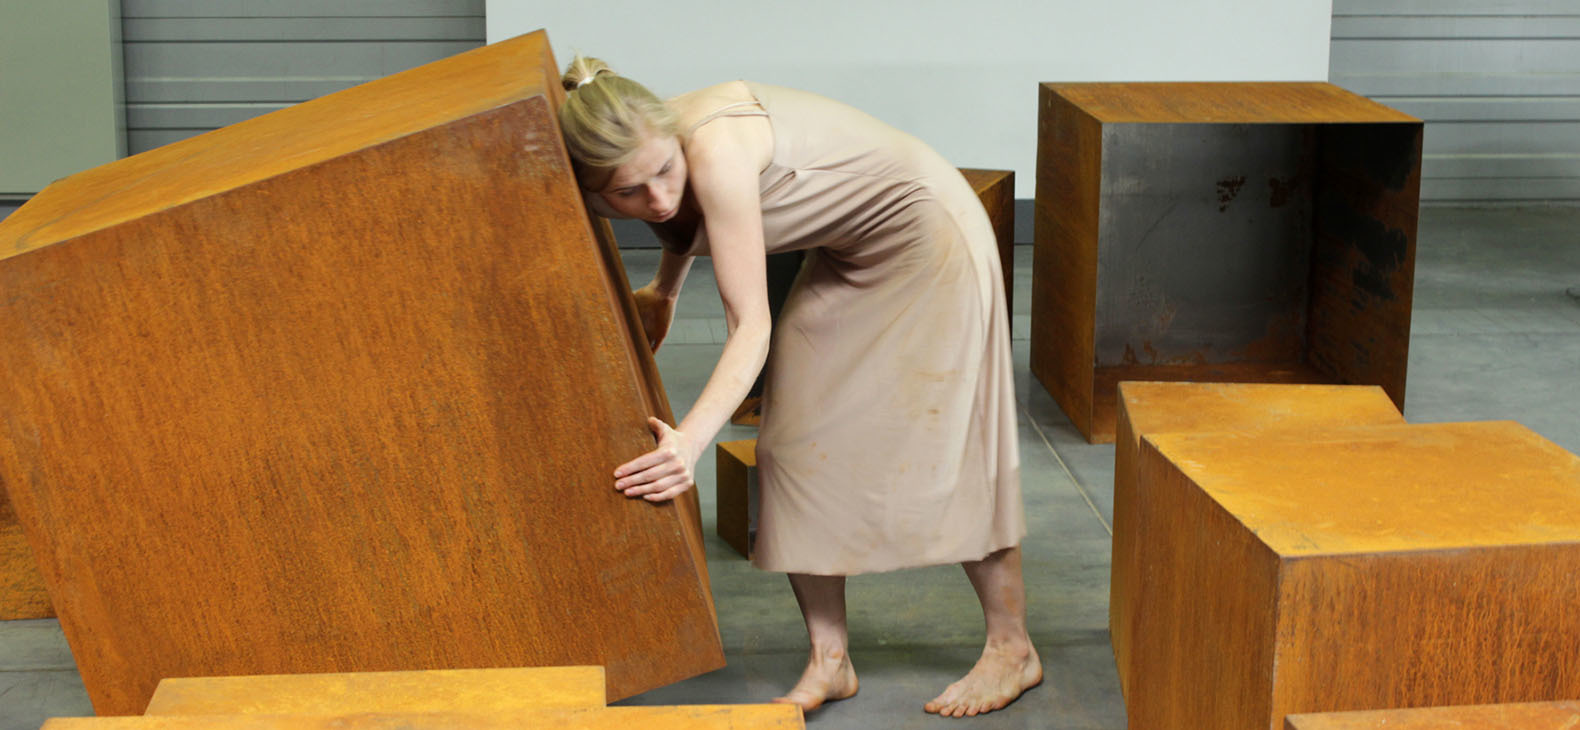 Beata Szczepaniak: About Sculpture - Order